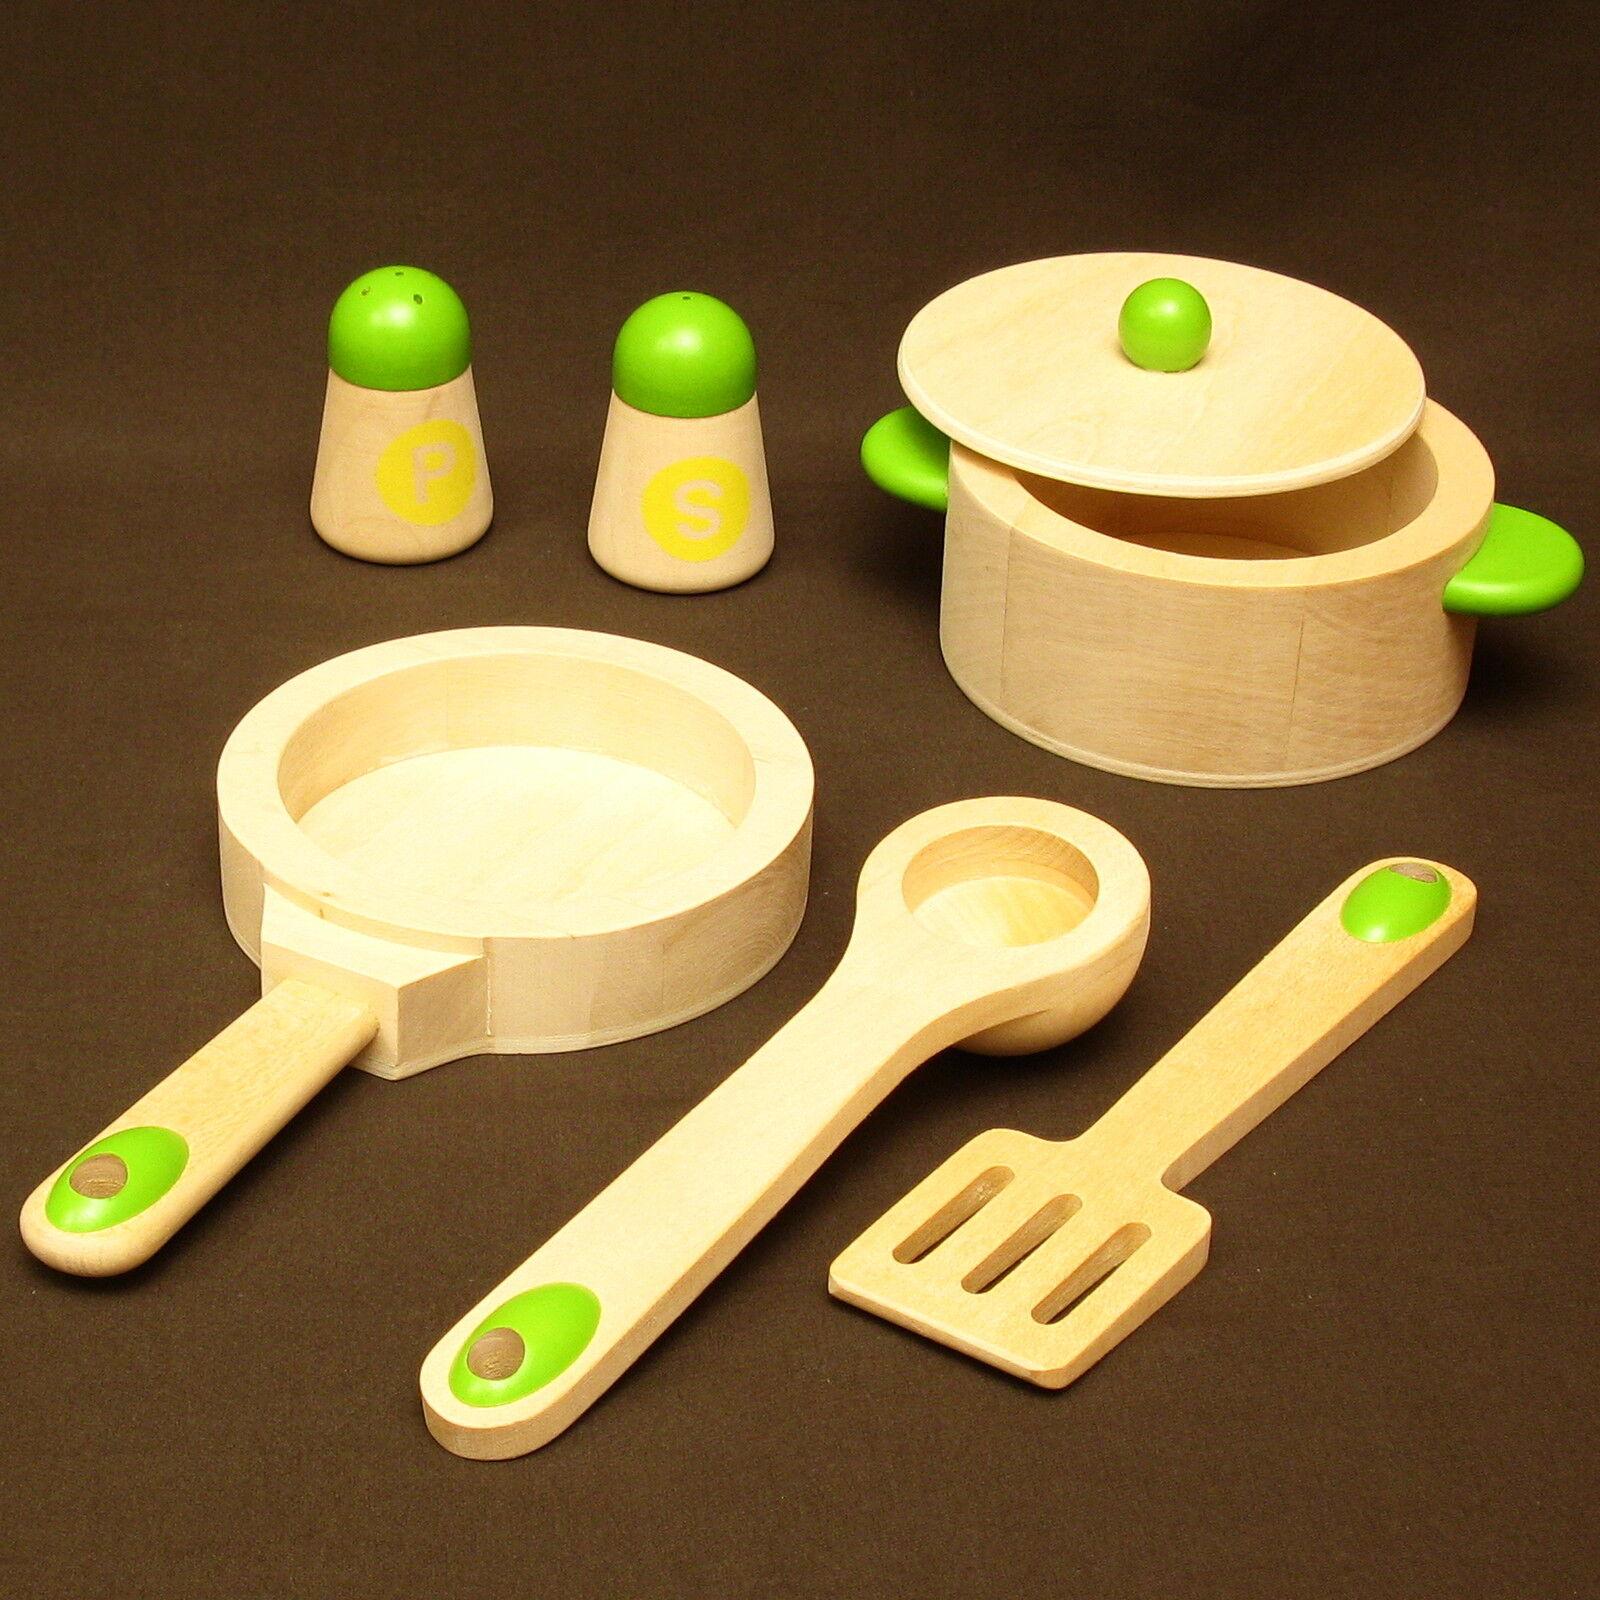 25-tlg Kinderküche m.Herd Ofen Spüle Schrank Schrank Schrank Regal +Zub. alles aus Holz FSC EN71 fe53f4